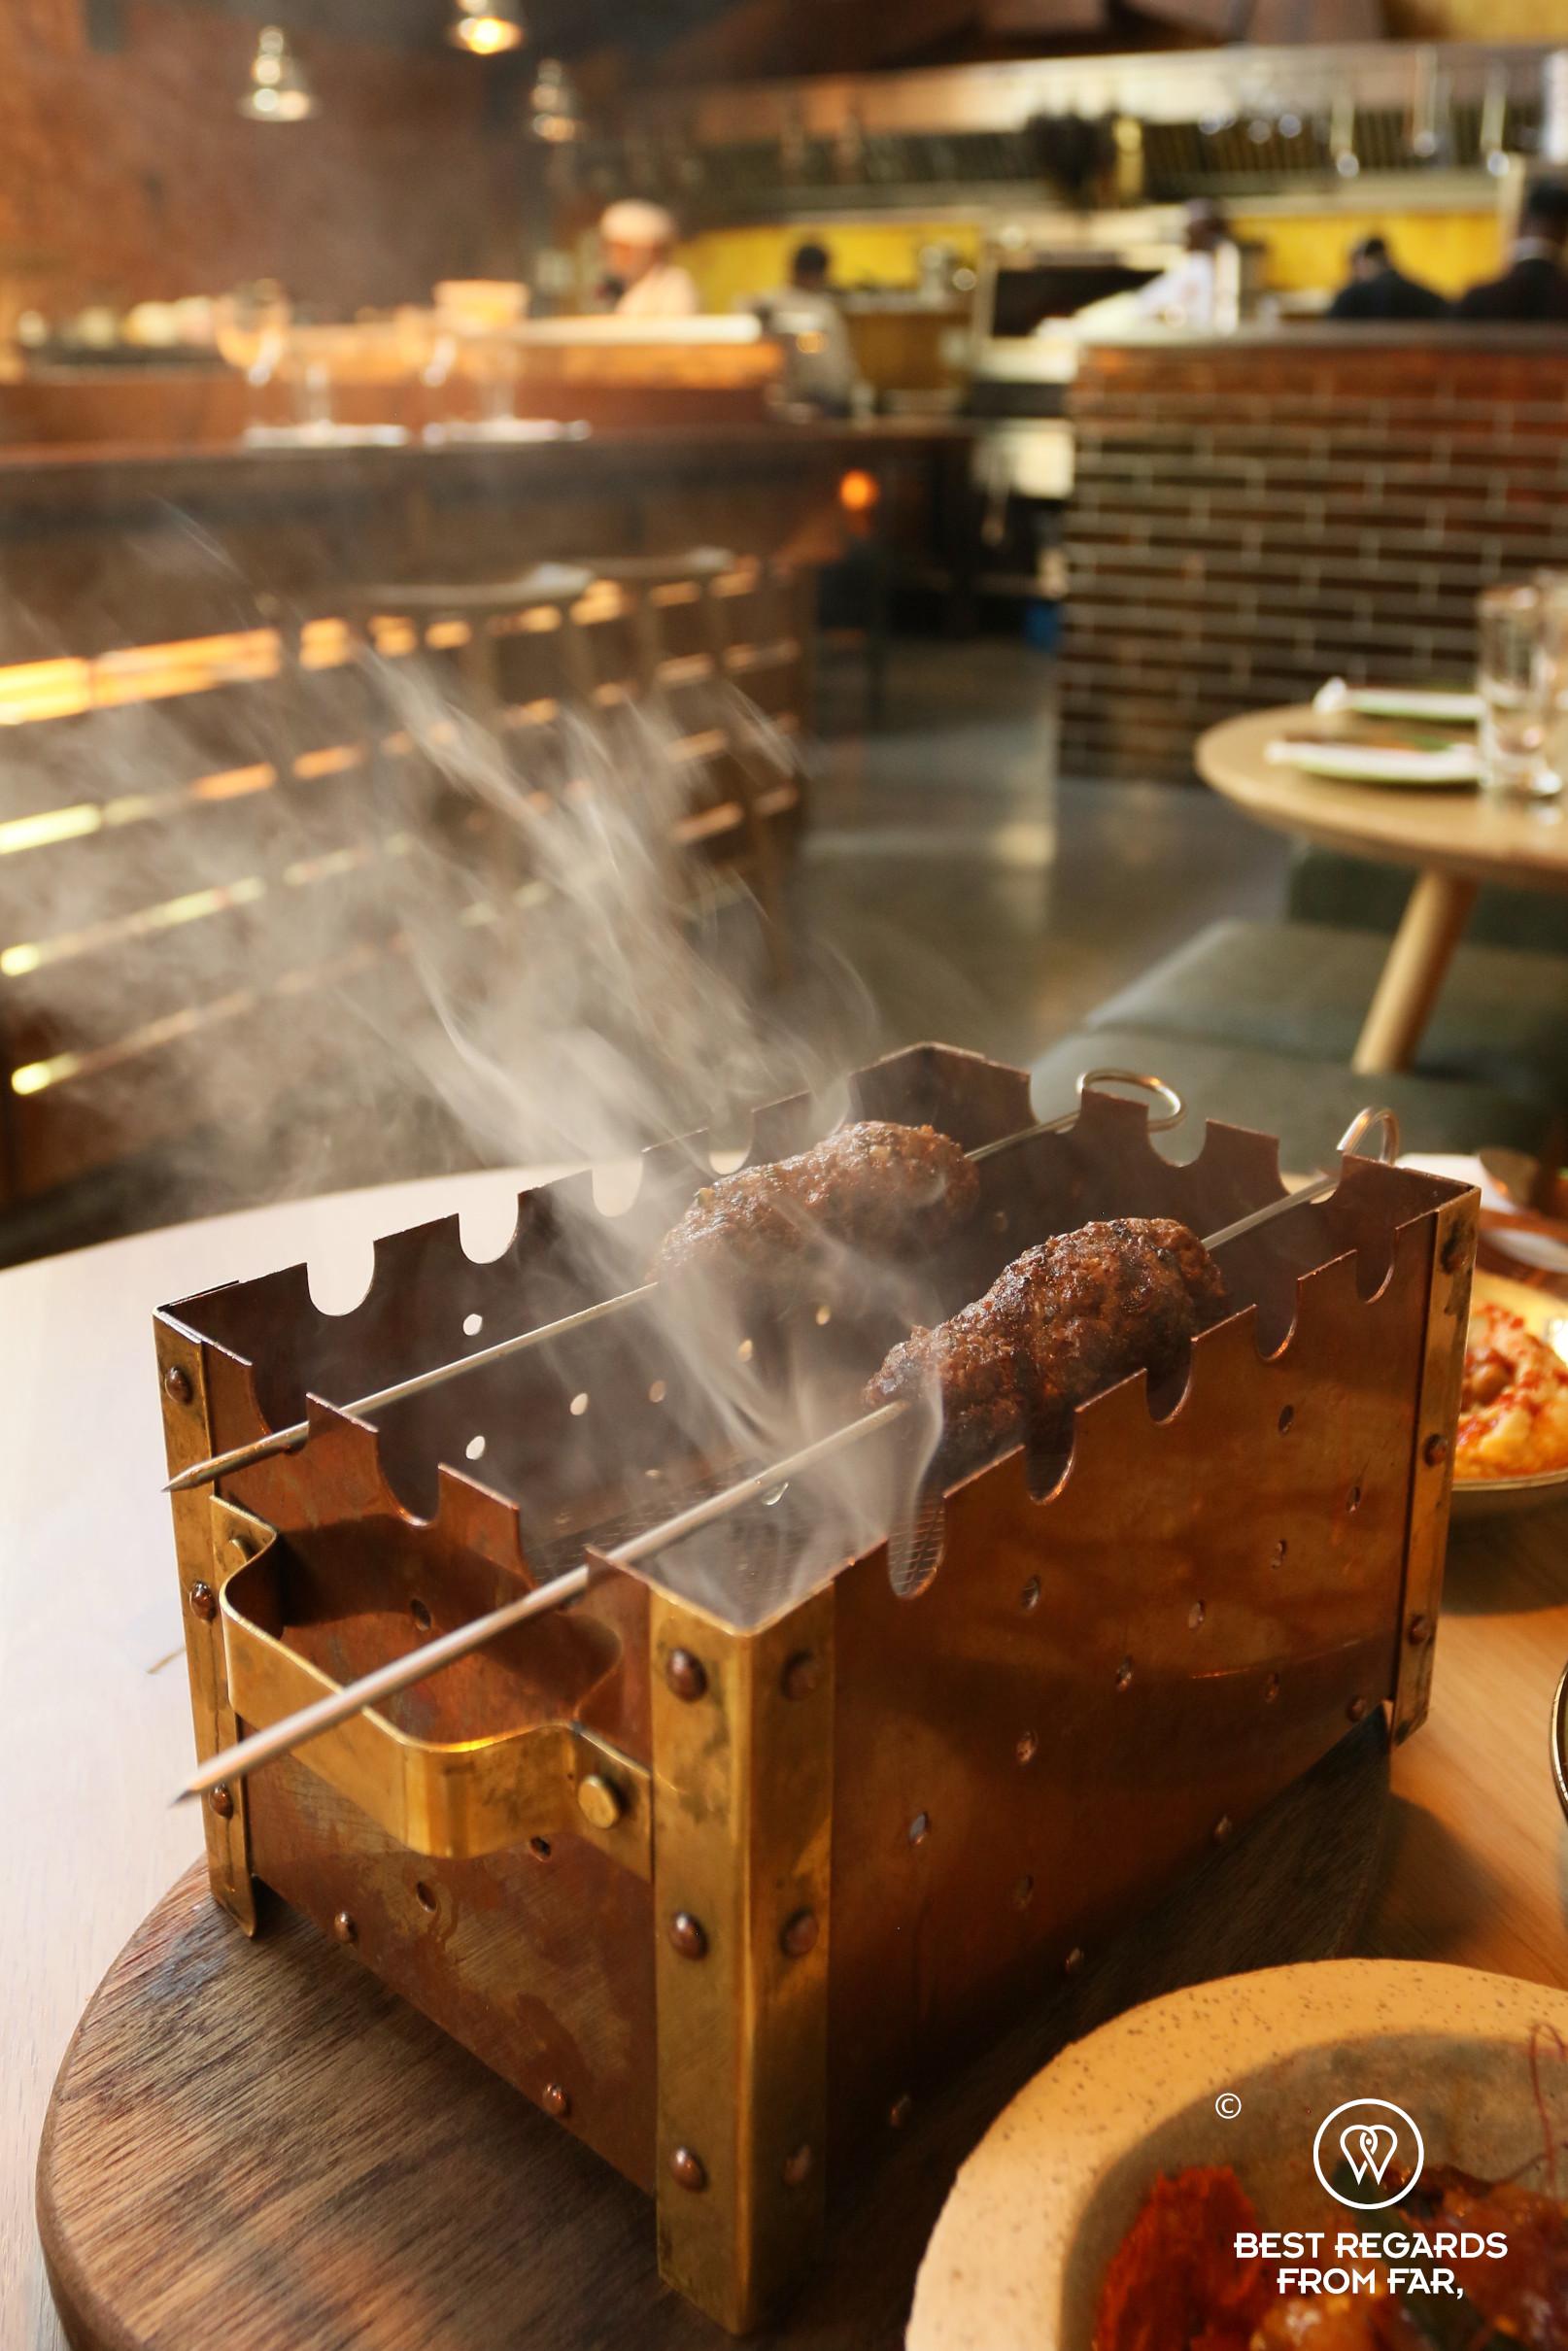 Smoking Turkish lamb kofta at the Chefs Warehouse Mazza, Cape Town